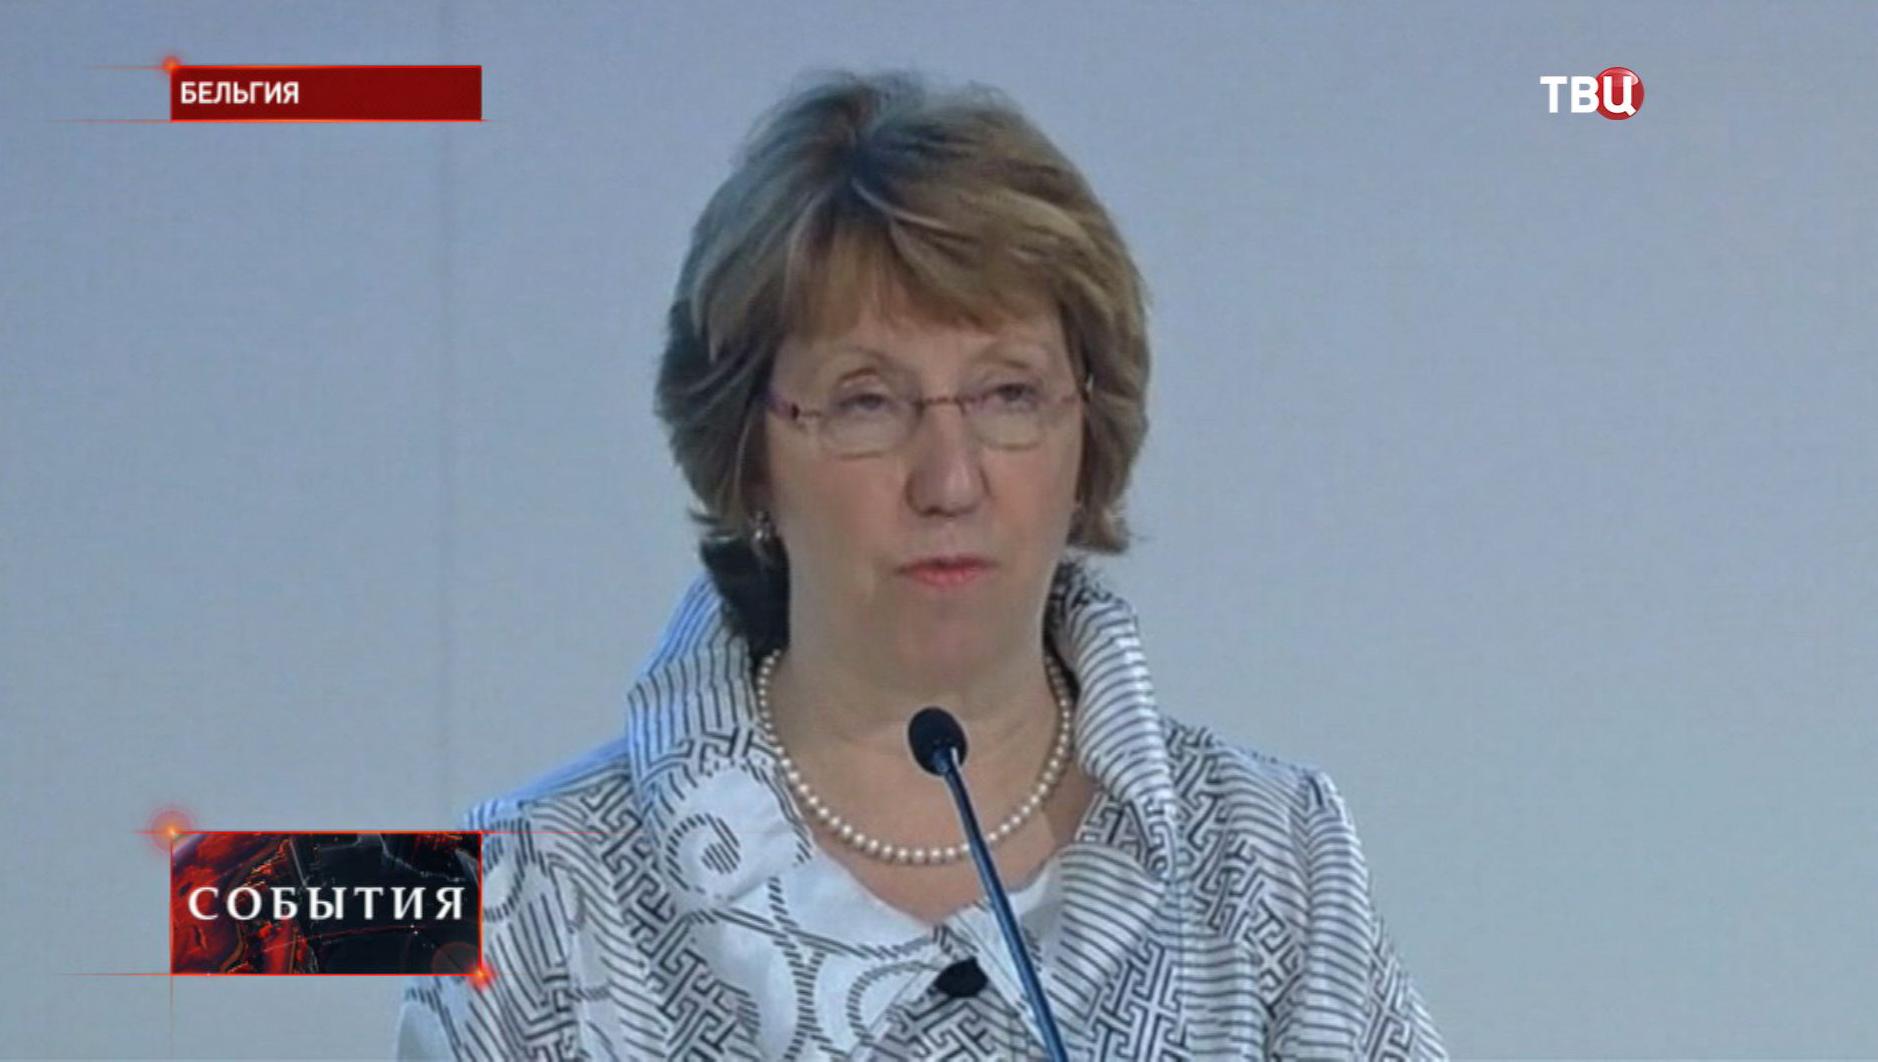 Глава дипломатии ЕС Кэтрин Эштон